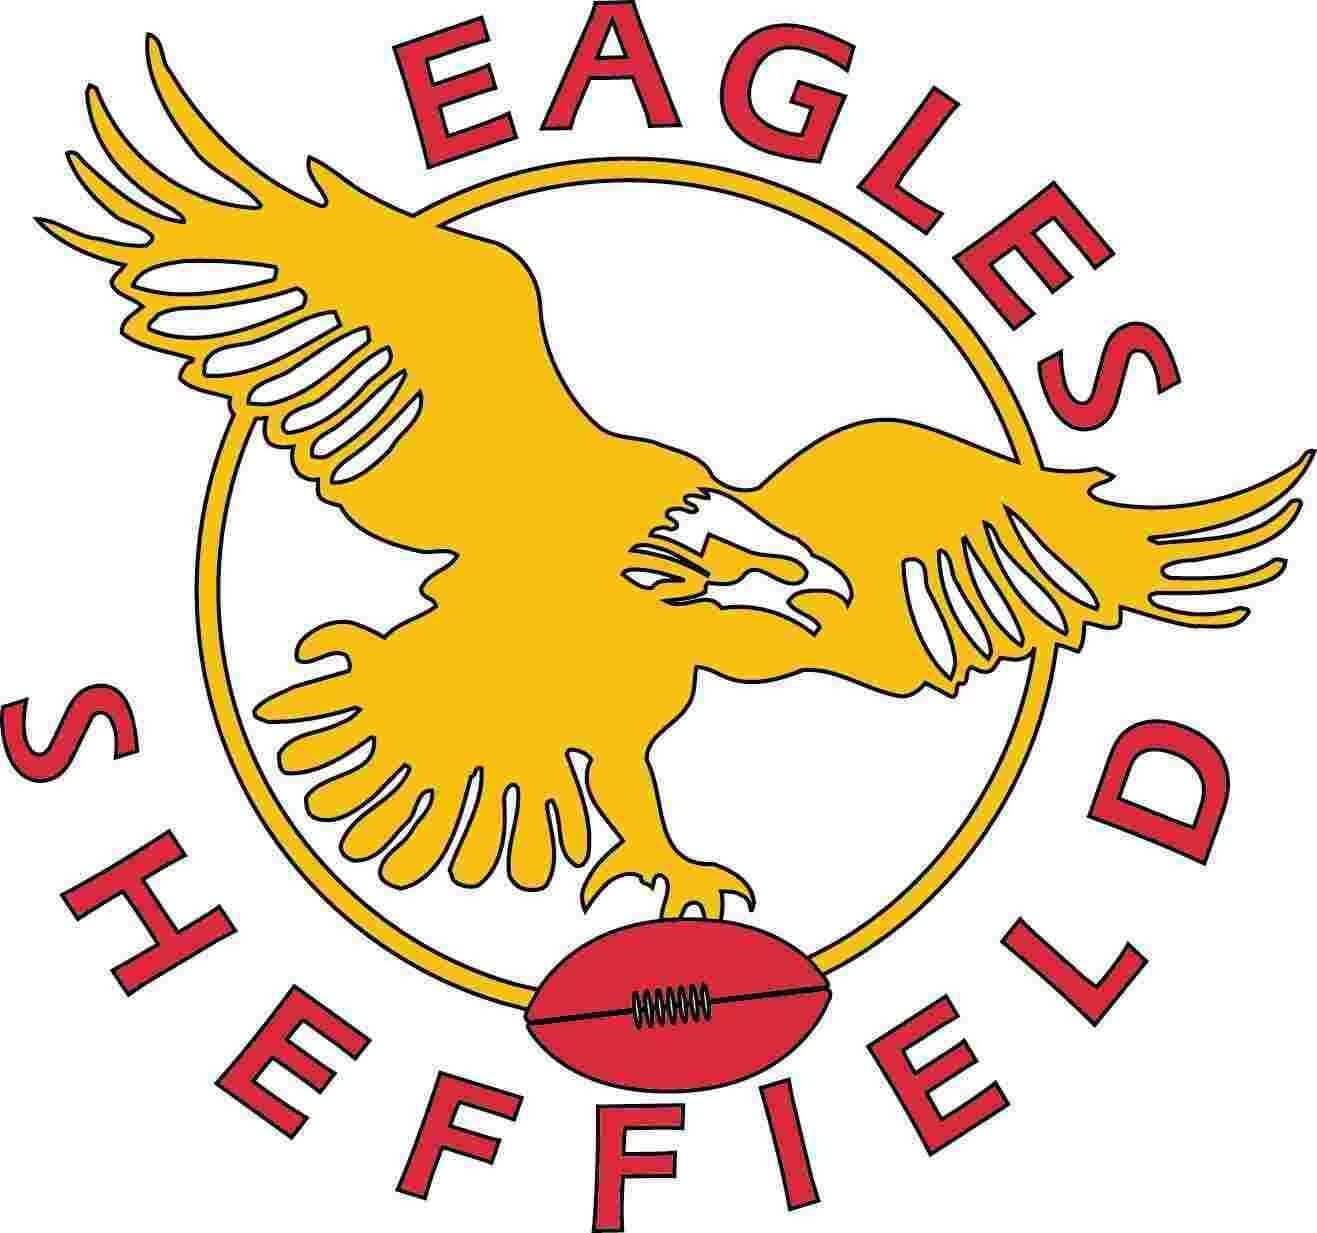 Sheffield Eagles